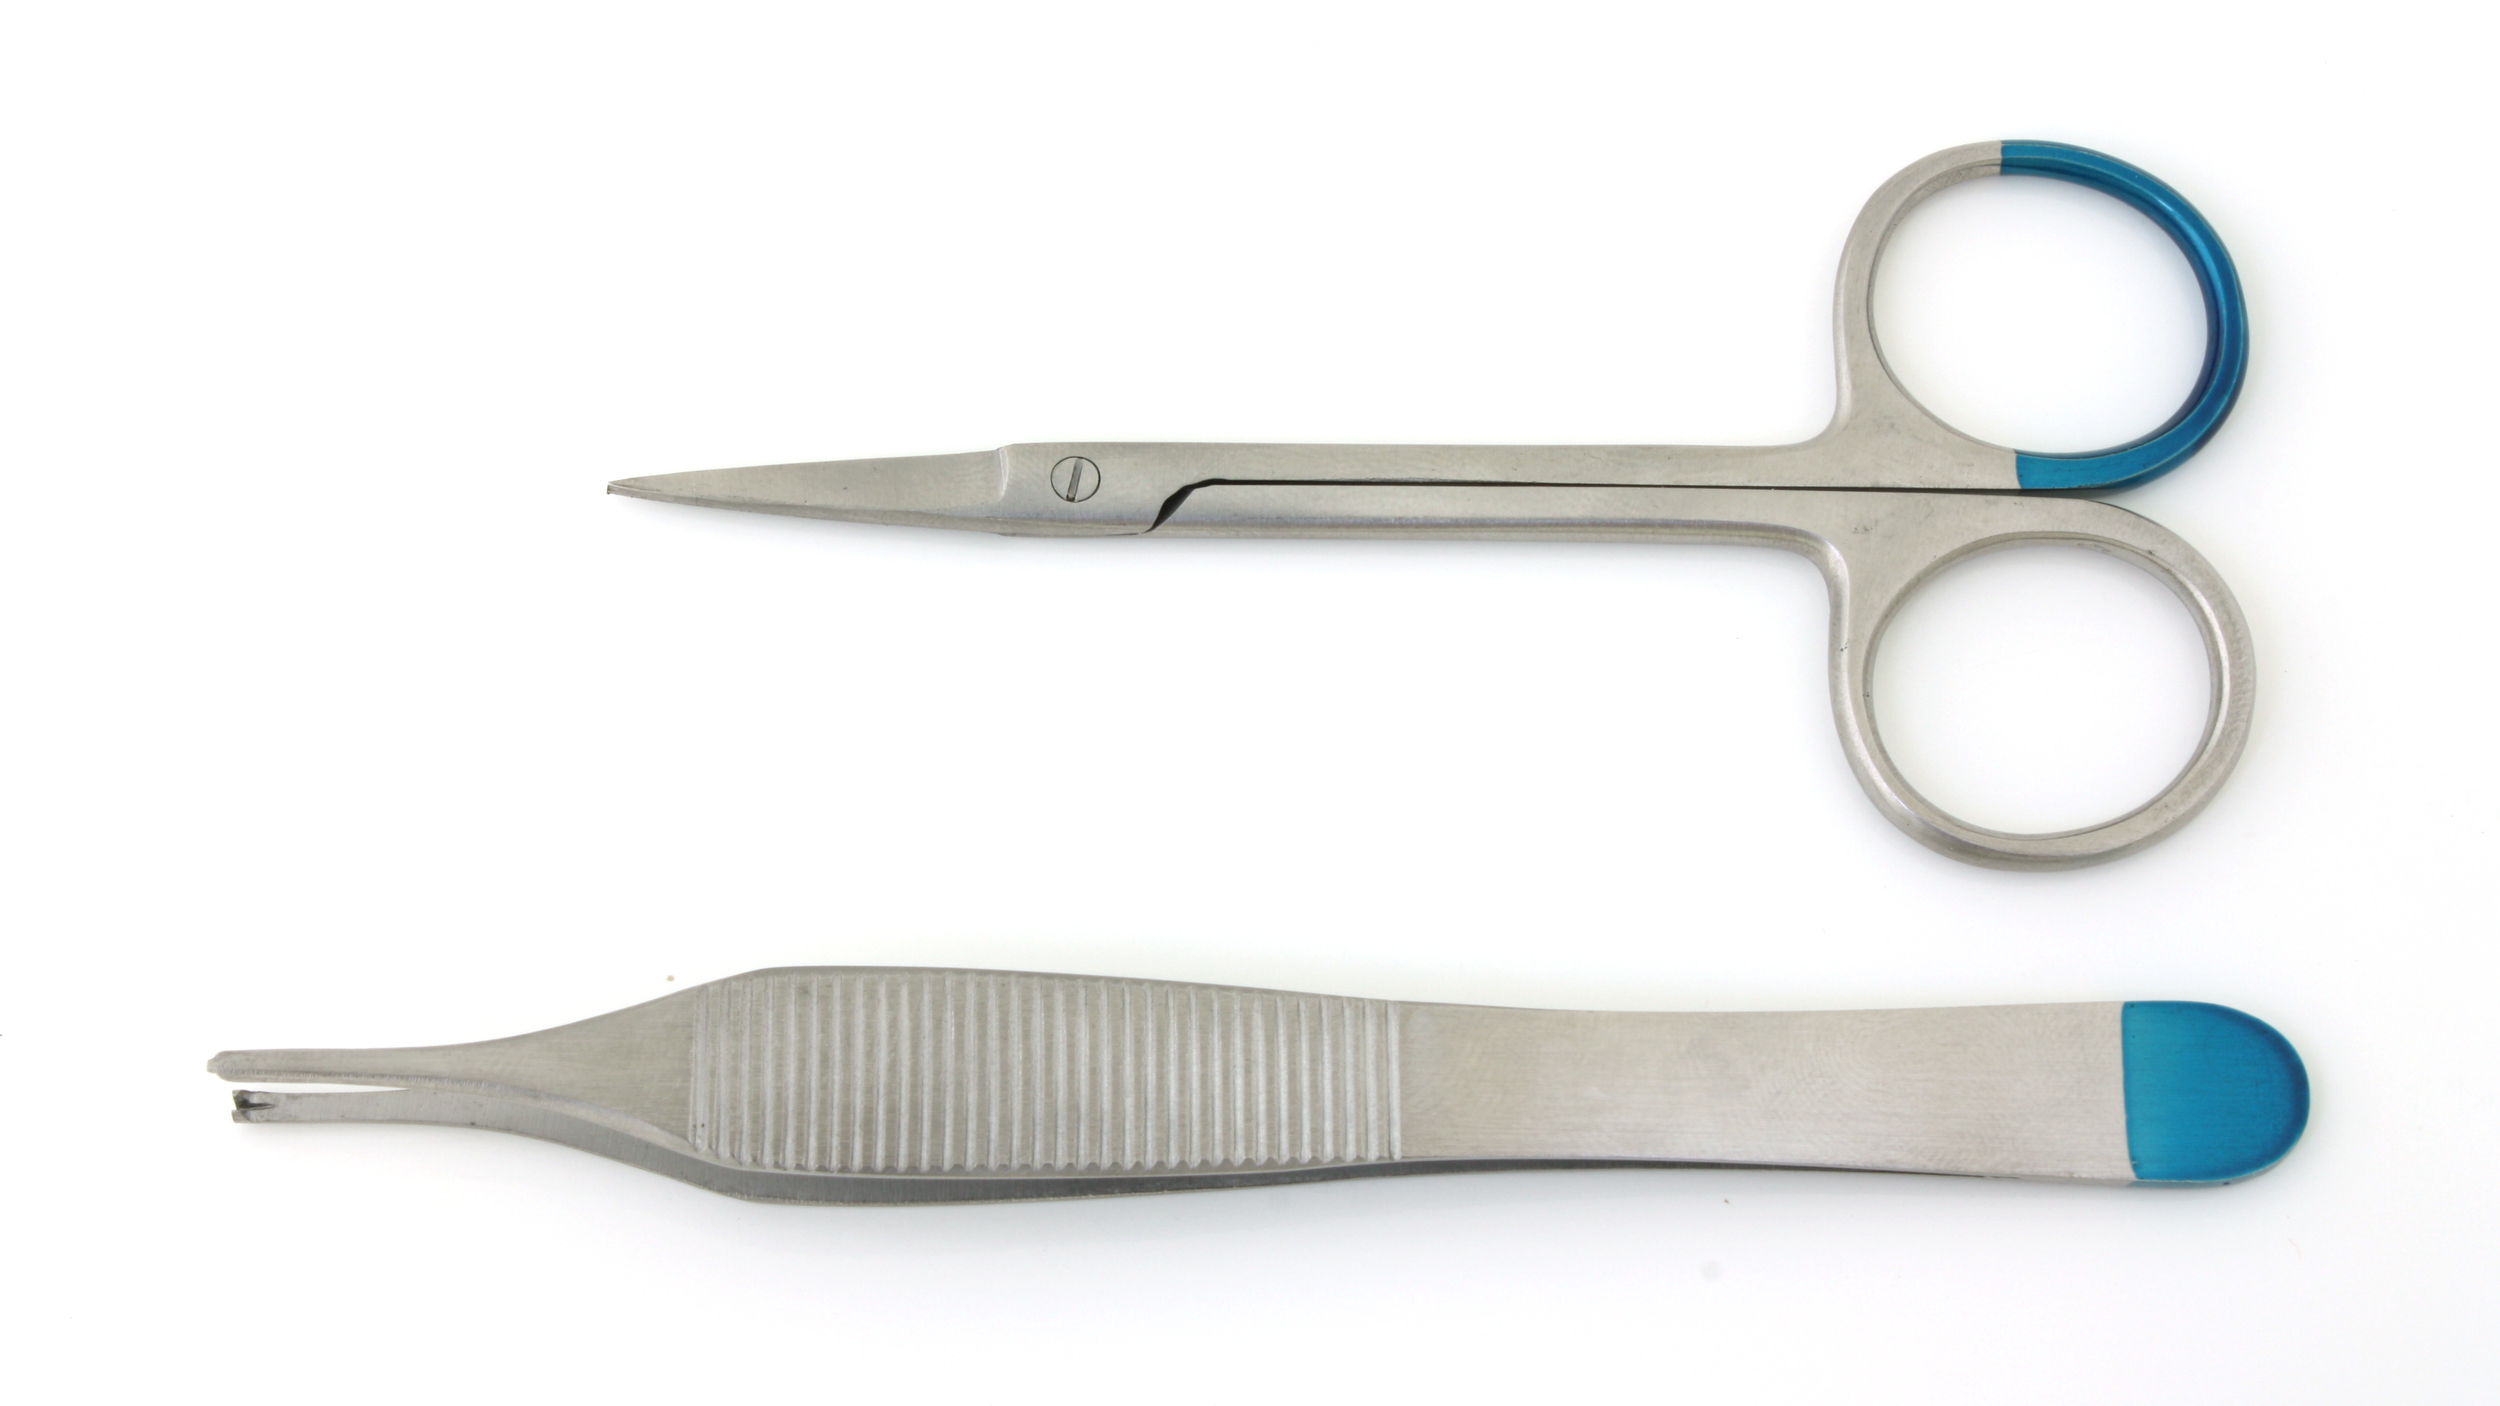 Disposable biopt set:   1 Iris schaar recht 90mm  1 Adson chirurgische pincet 1x2 tanden 12cm